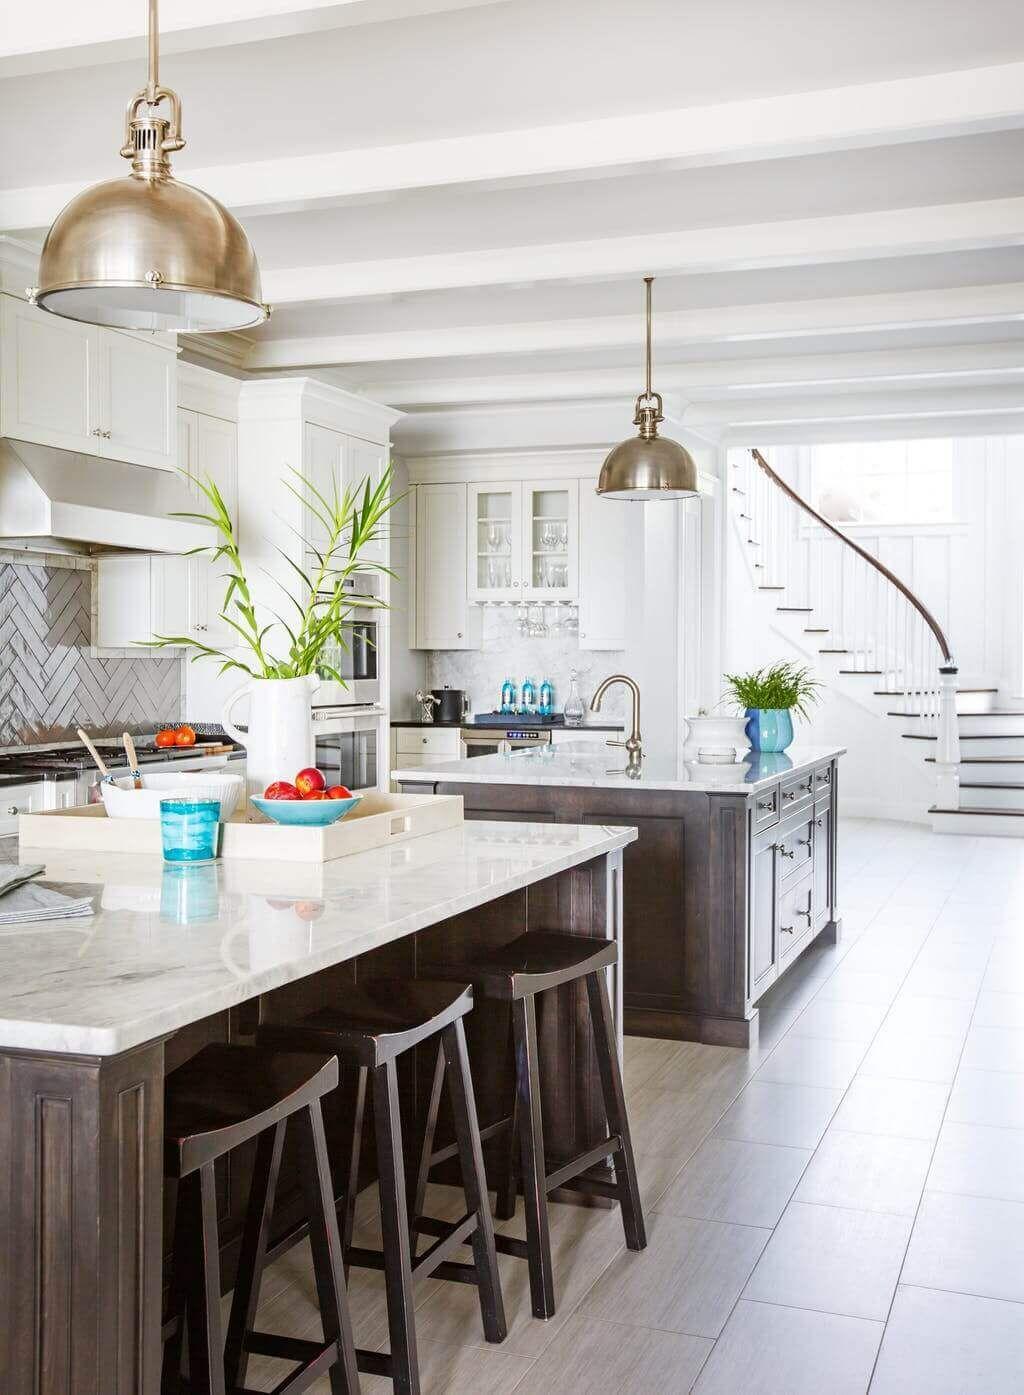 25 Kitchen With 2 Islands Layouts Kitchen Layout Kitchen Layouts With Island Kitchen Remodel